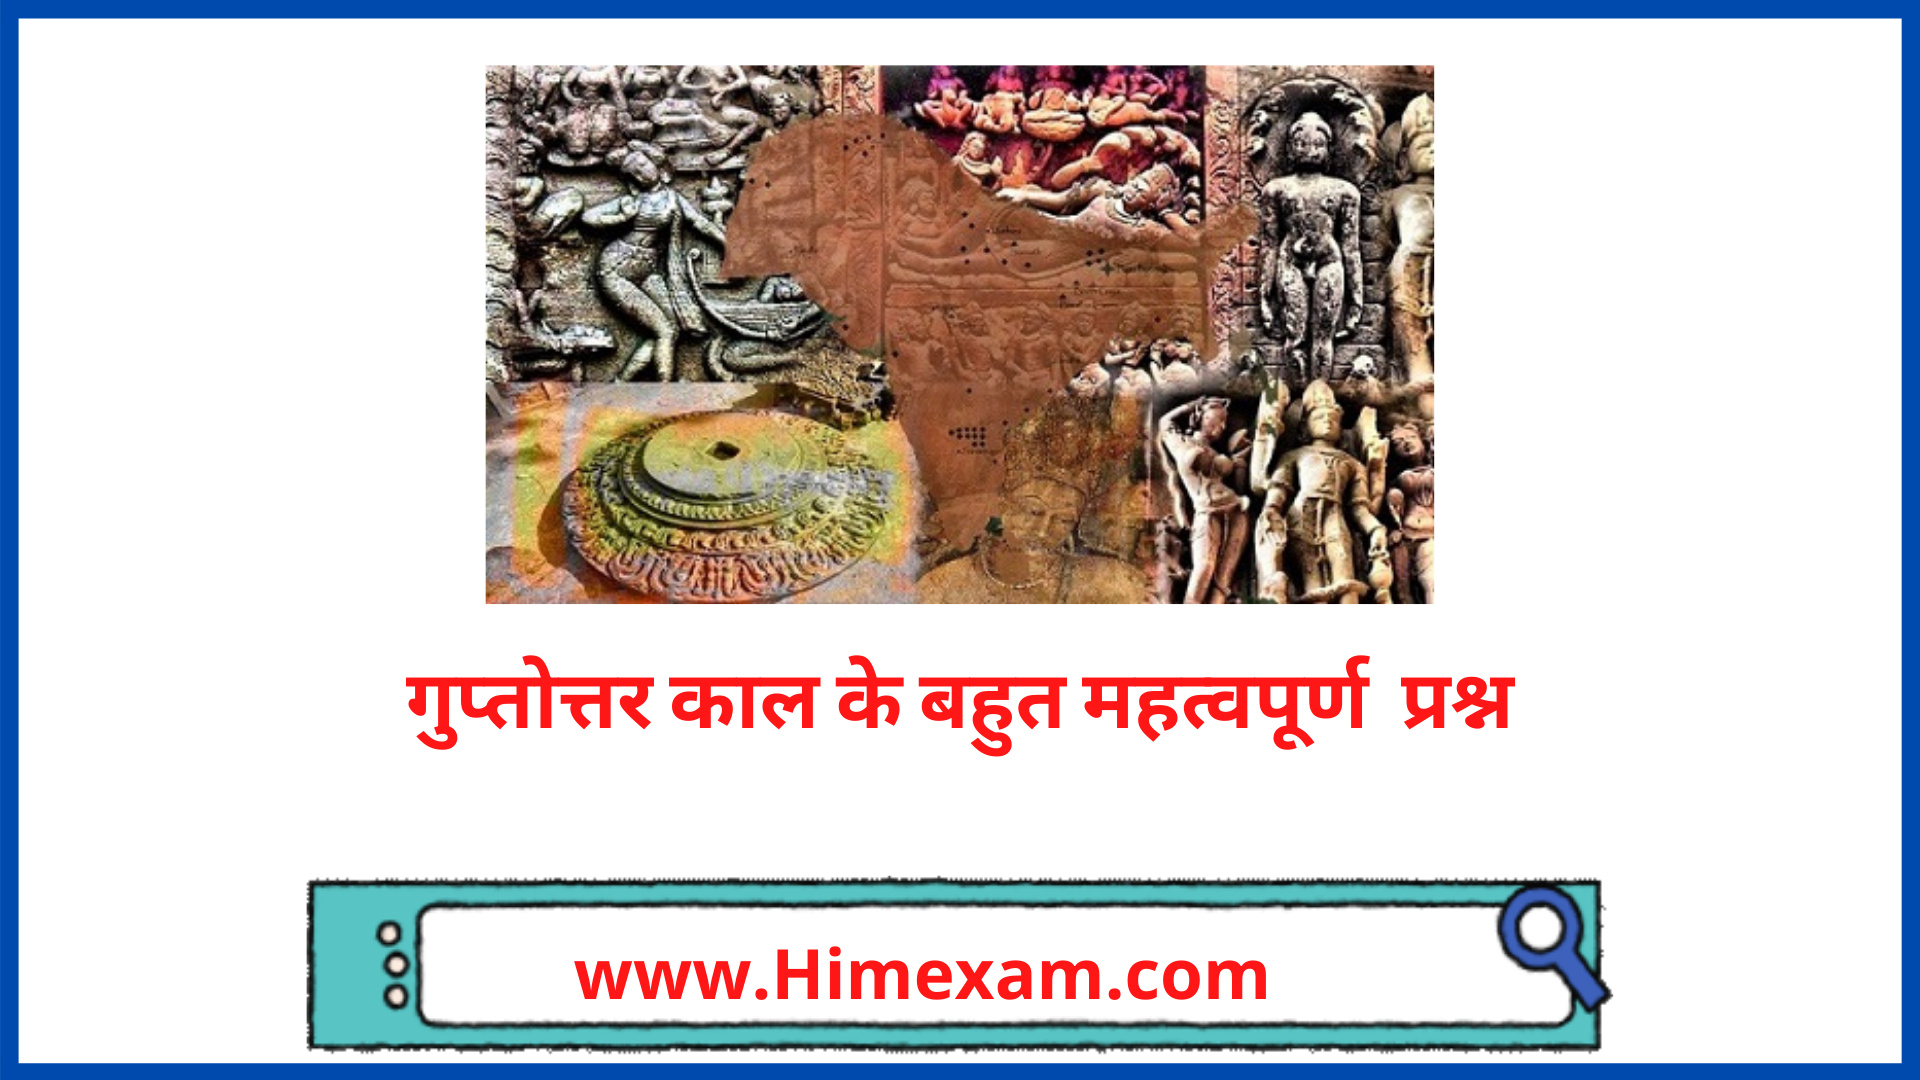 Guptotar kaal MCQ Question Answer In Hindi